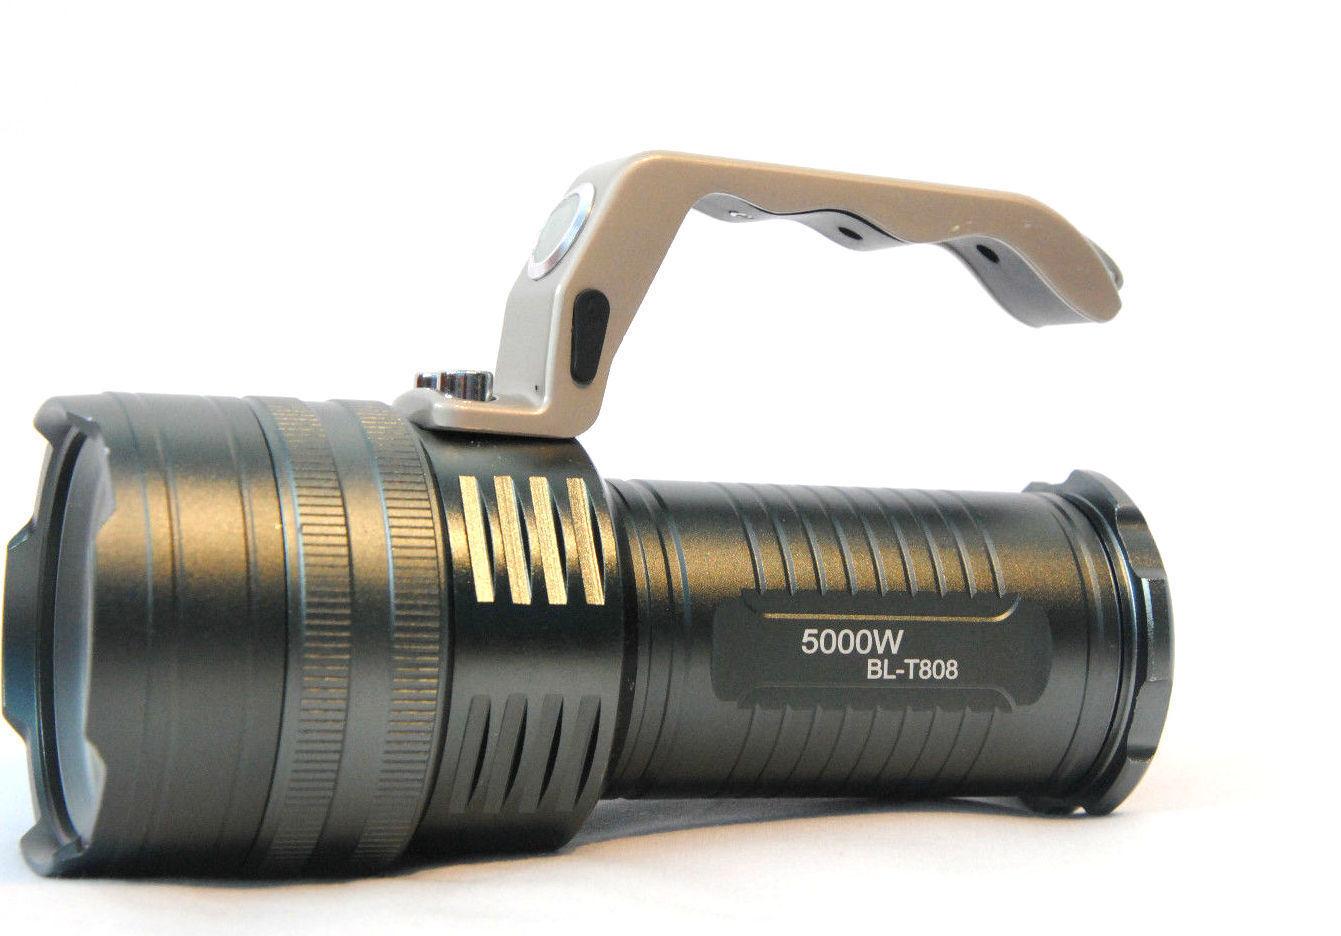 Extrem Helles BL-T808 CREE LED Handlampe T6     inkl. 3 Akku 8800mAh + Ladegerat 5c313d